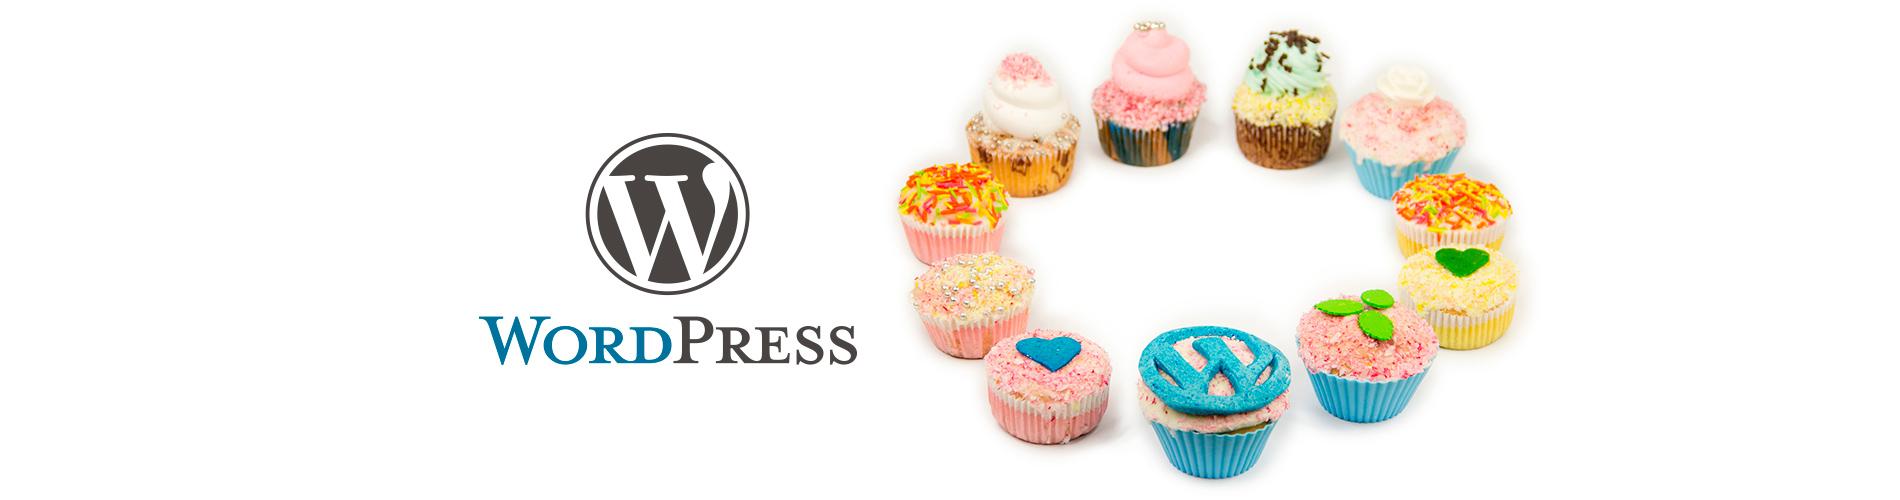 WordPressサイト制作のためのプレ講座開催